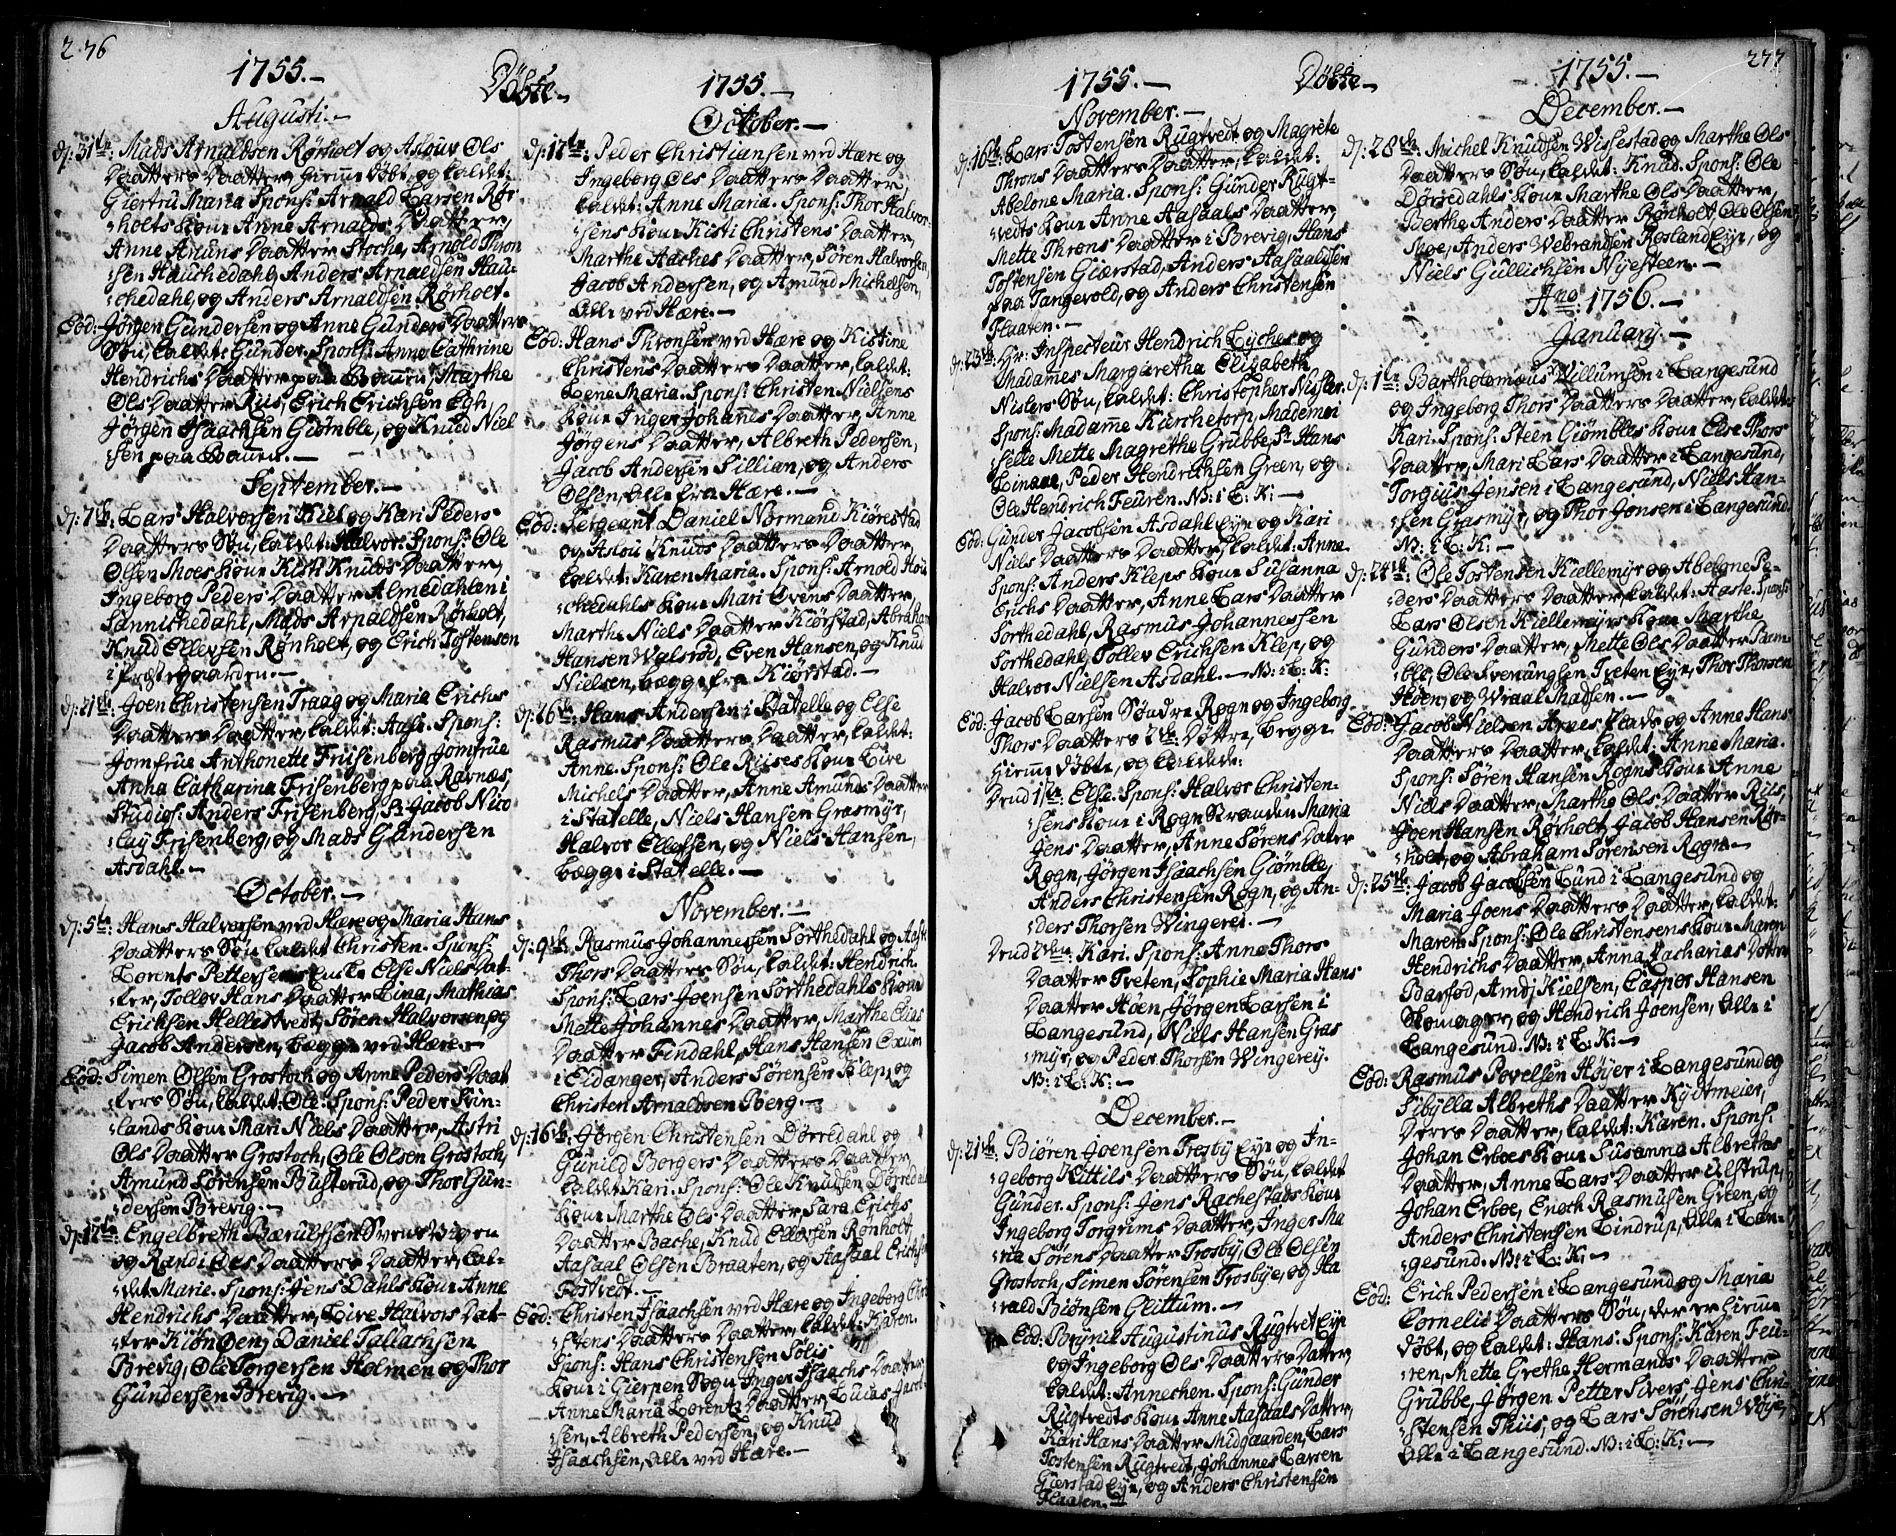 SAKO, Bamble kirkebøker, F/Fa/L0001: Ministerialbok nr. I 1, 1702-1774, s. 276-277